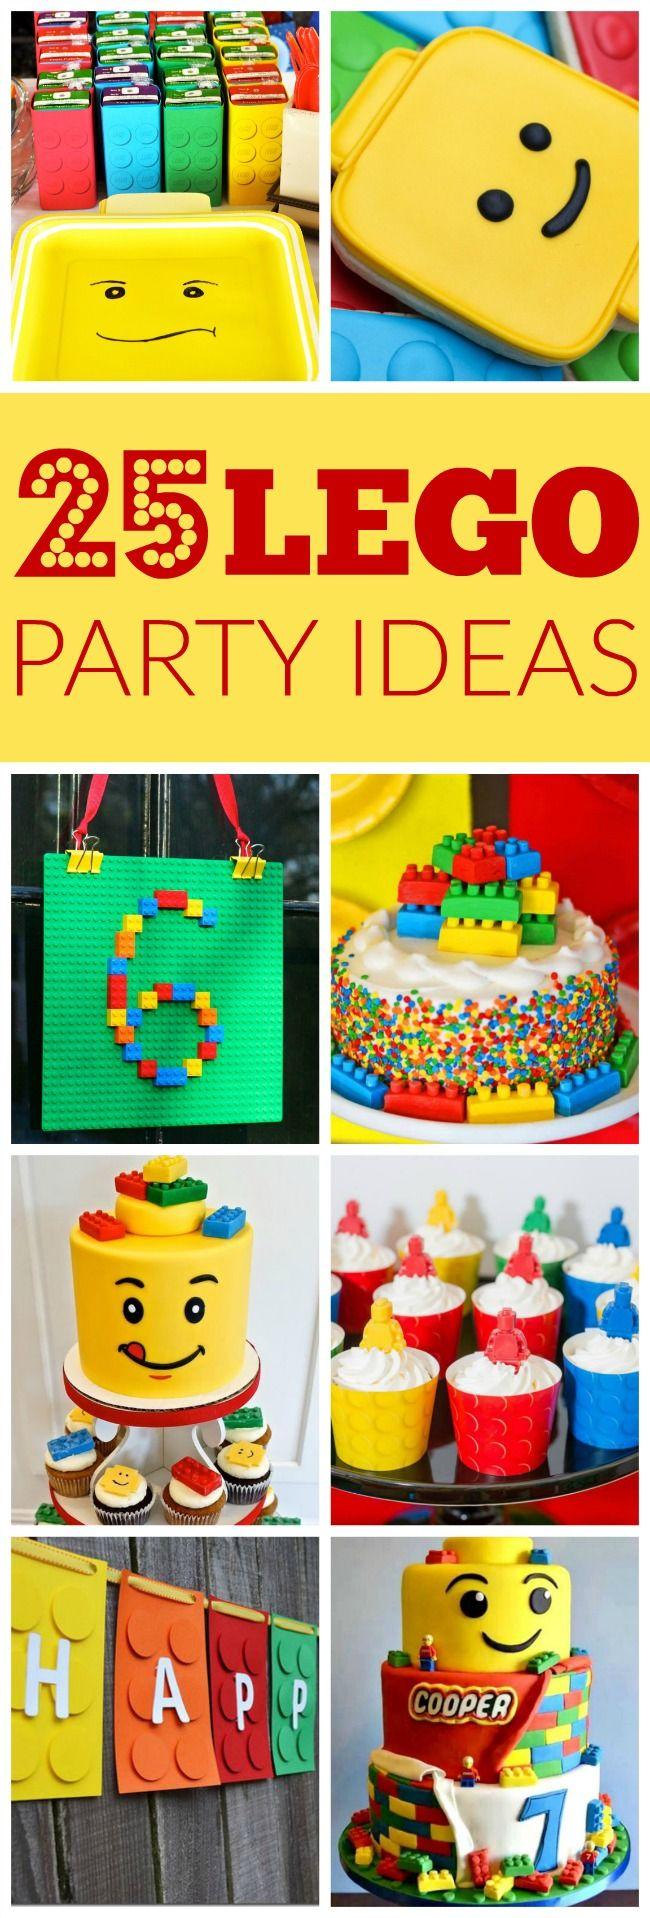 25 Lego Themed Party Ideas Lego Themed Party Lego Birthday